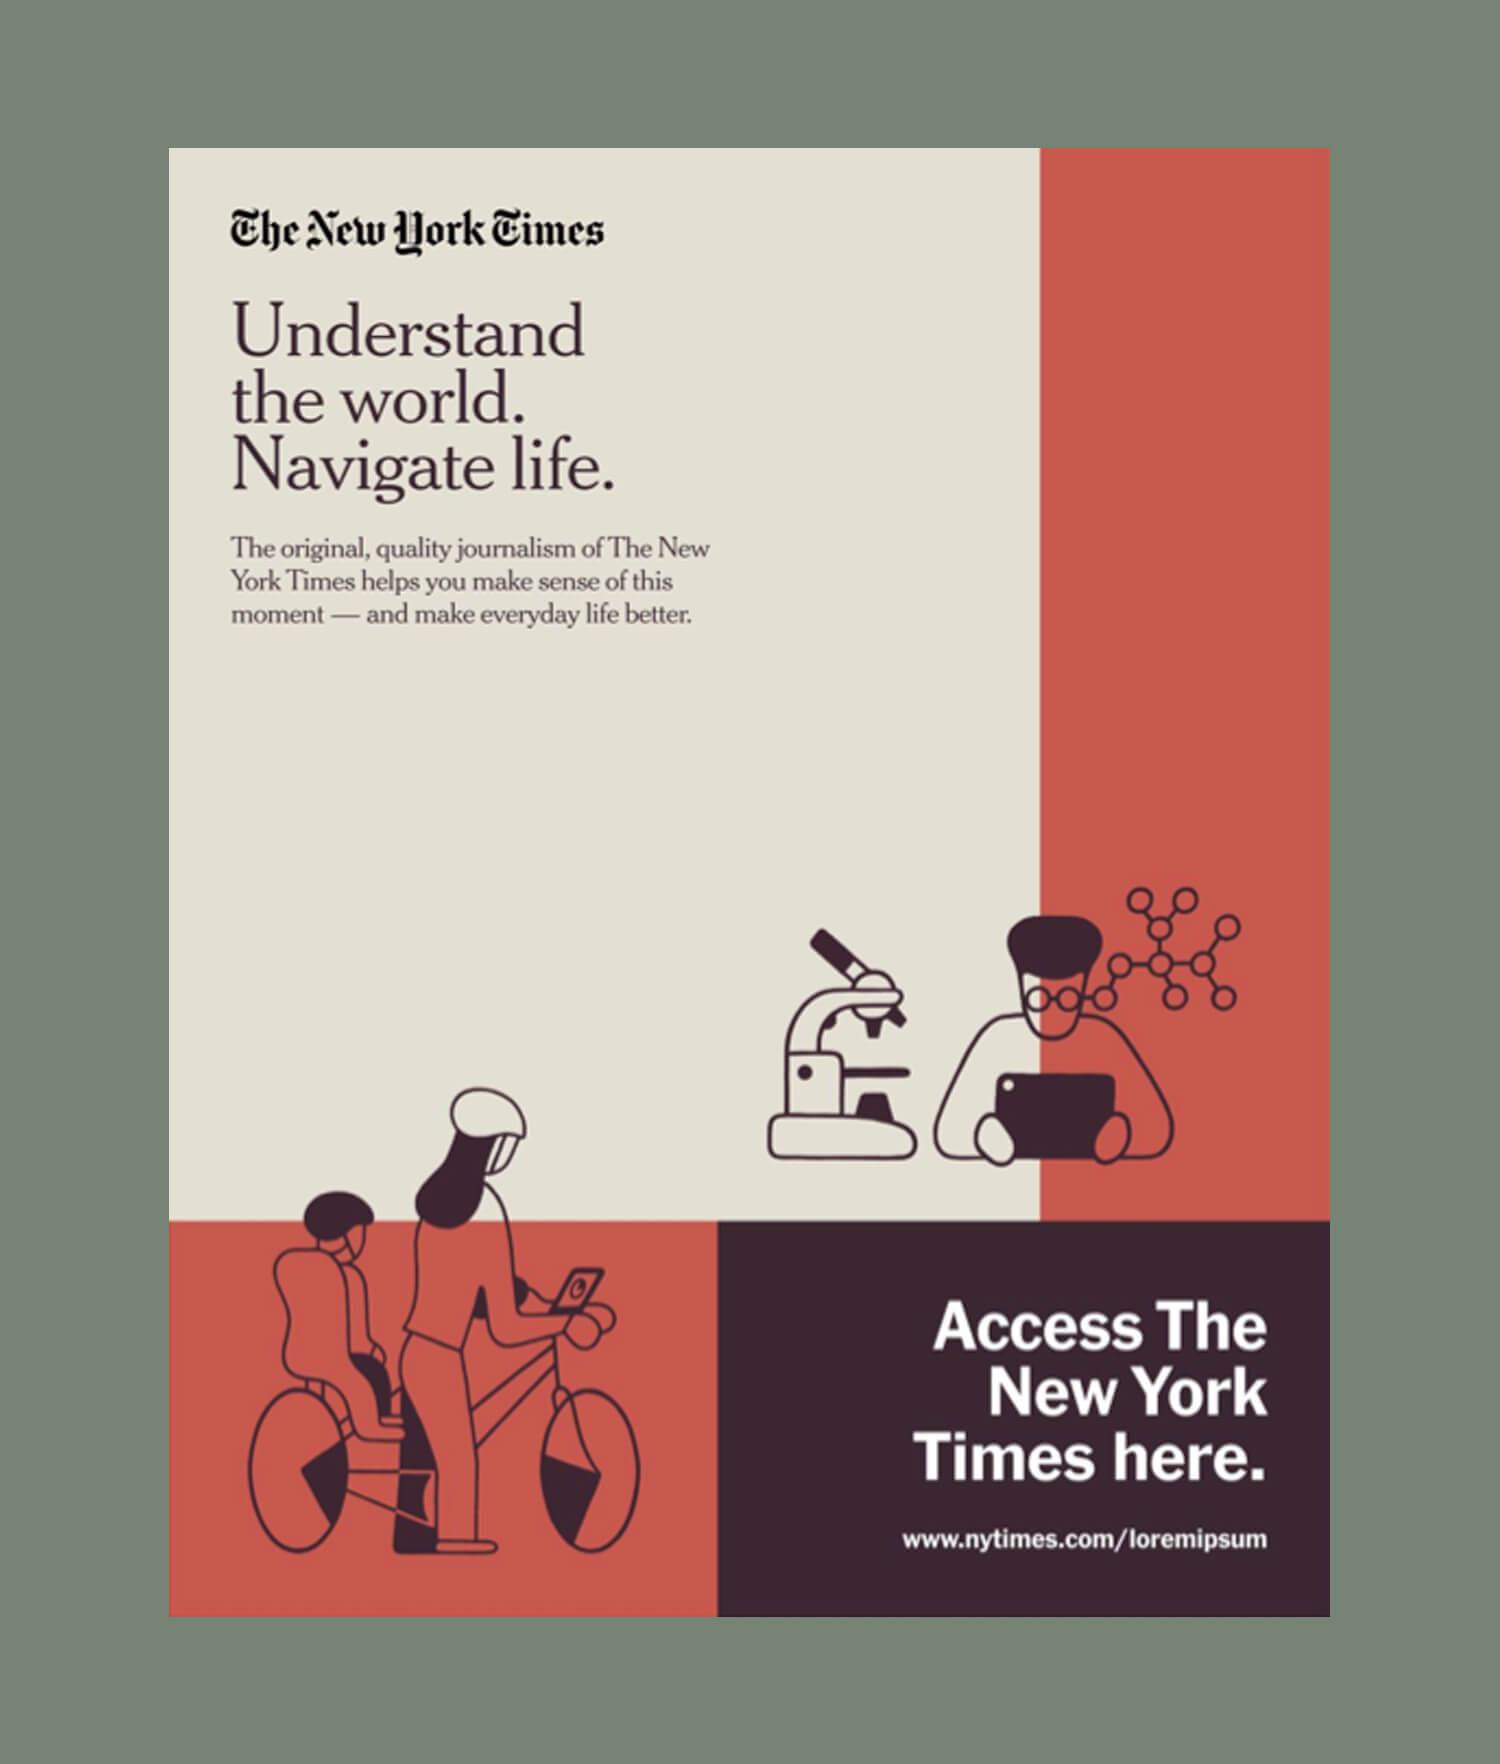 miguel-porlan-illustration-the-new-york-times-b2b-spots-11